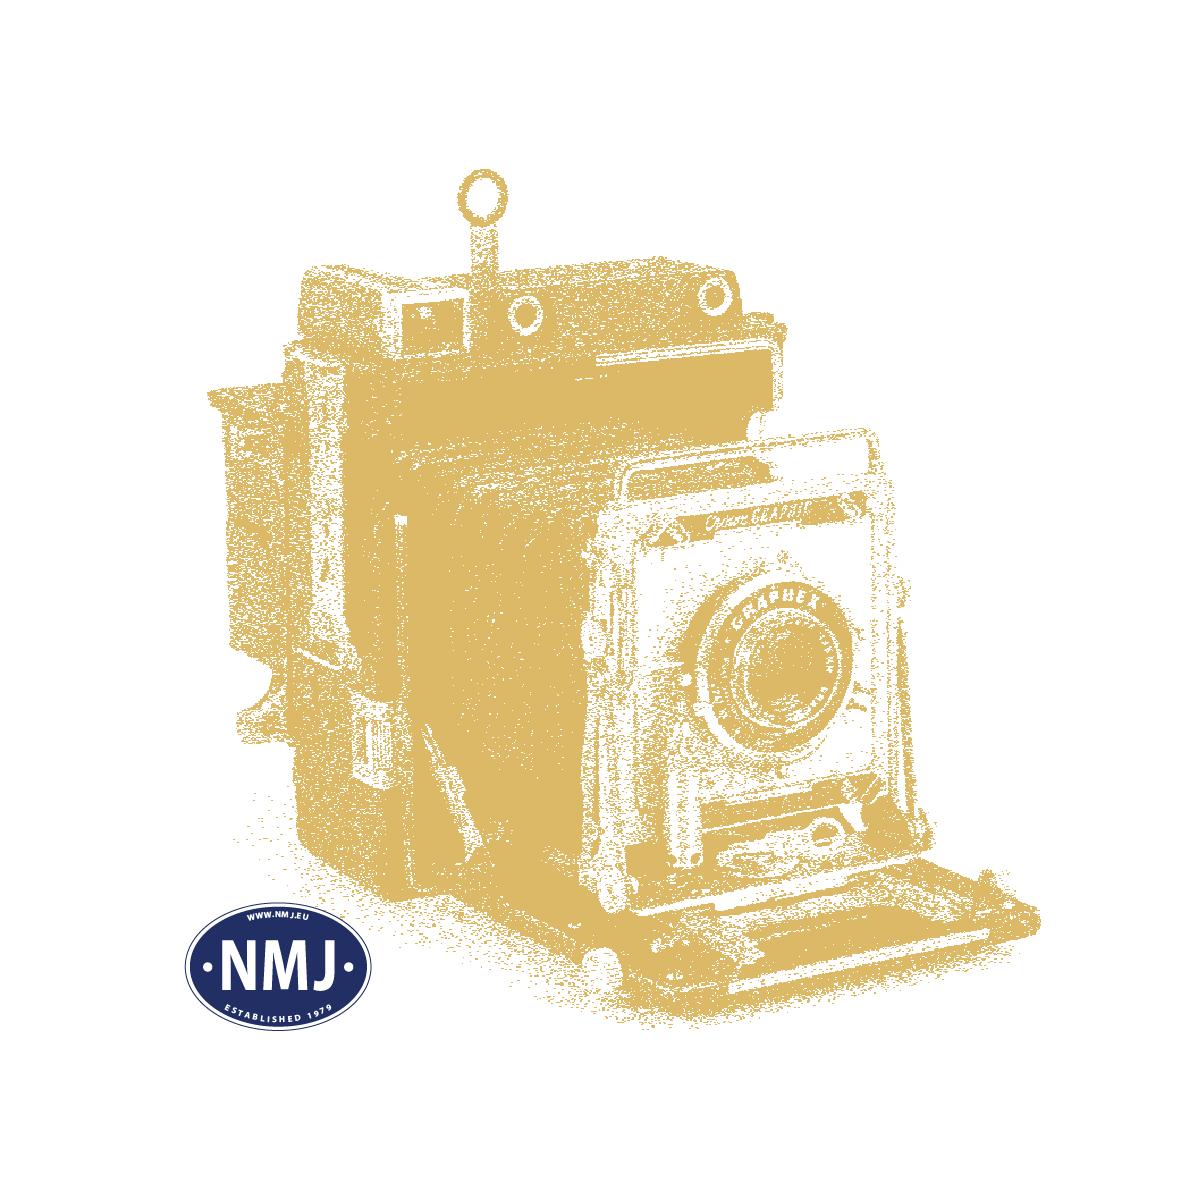 NMJS Elo 0298-0 - *NMJ 40 år* NMJ Superline NSB Elo 21 76 511 0 298-0 m/ Bremseplattform